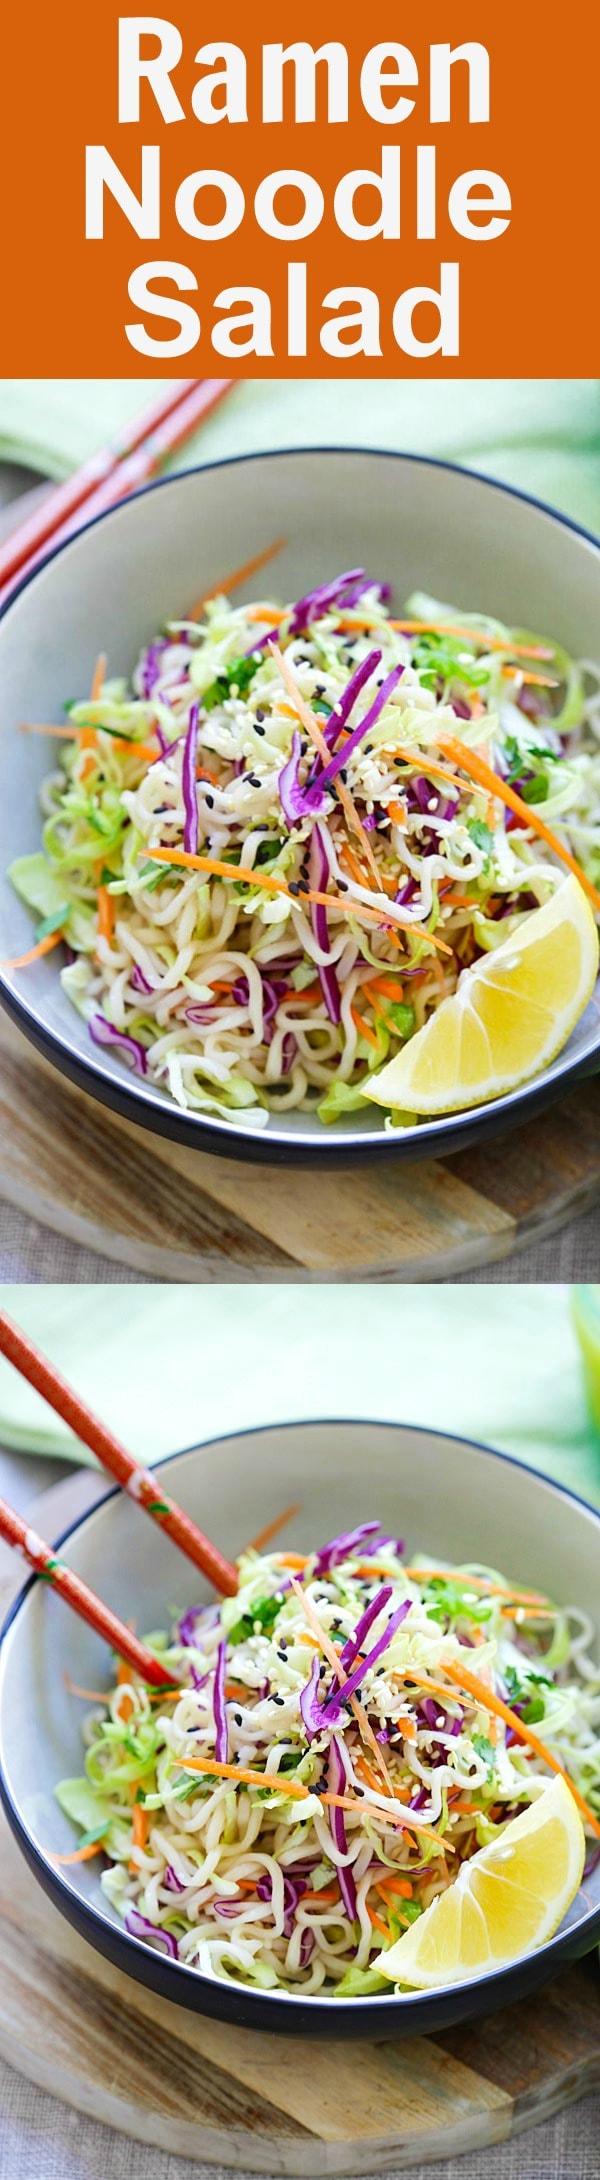 Ramen Noodle Salad Recipe | Rasa Malaysia